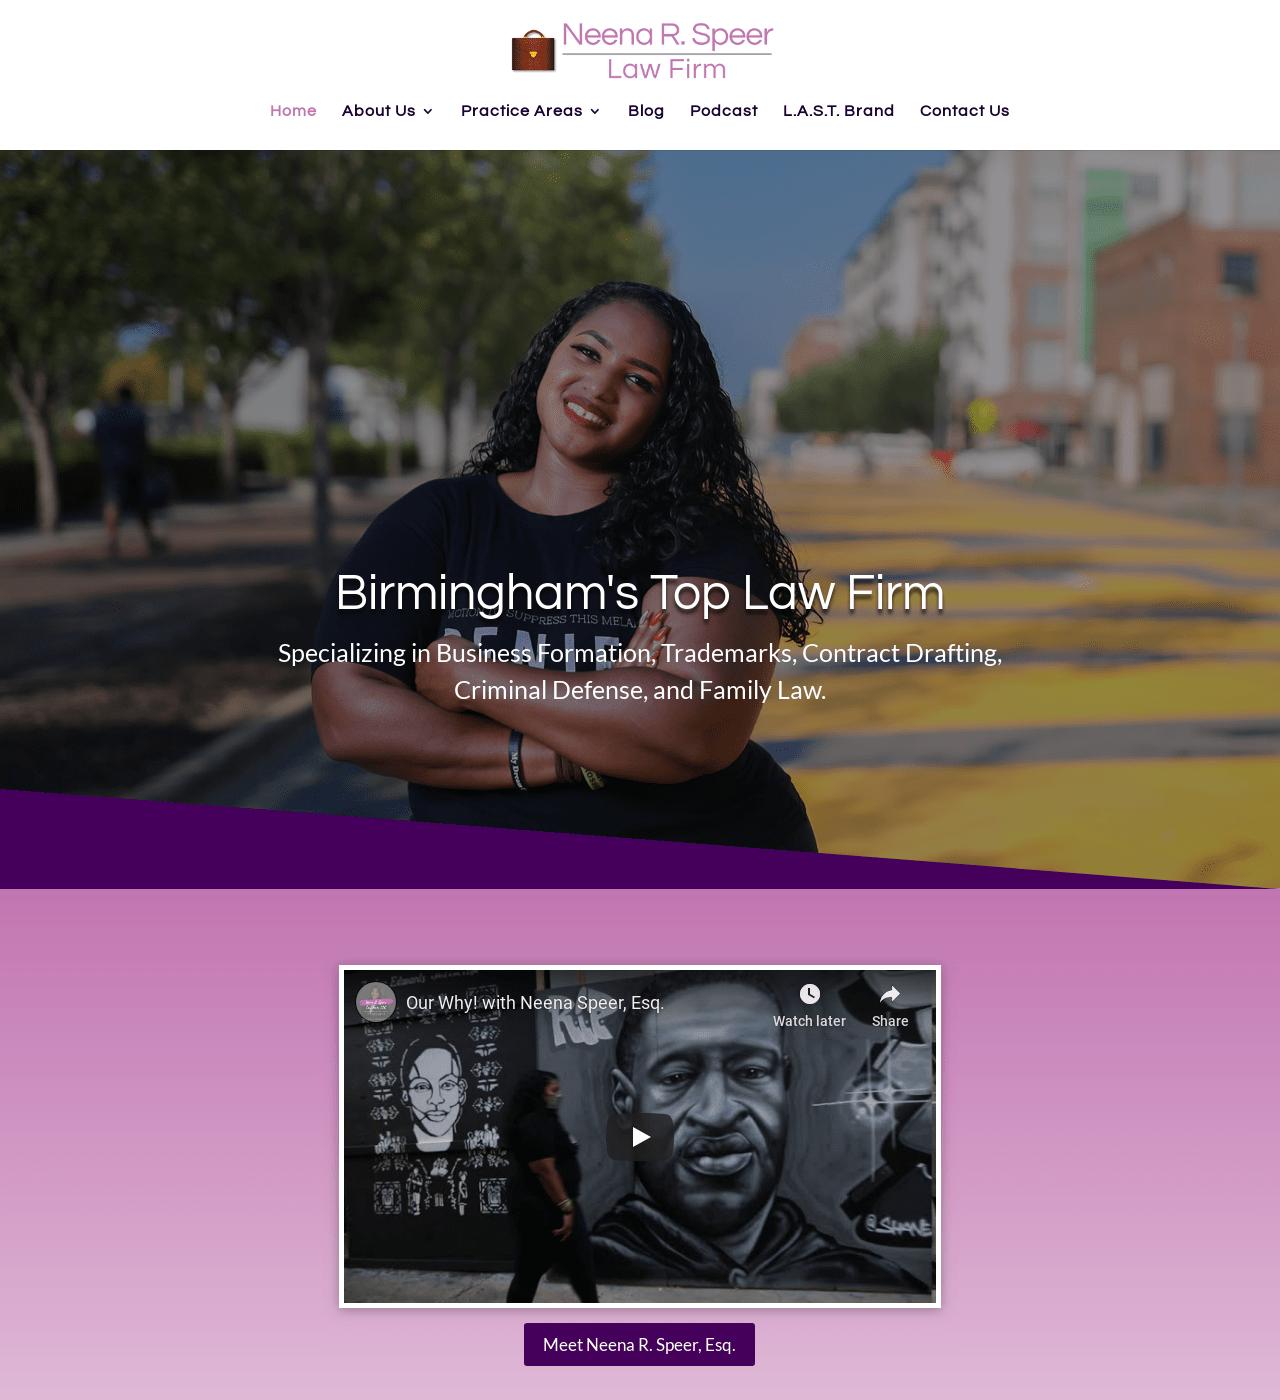 Birmingham-Web-Design-Agency-C-Kinion-Design- Neena R. Speer Law Firm